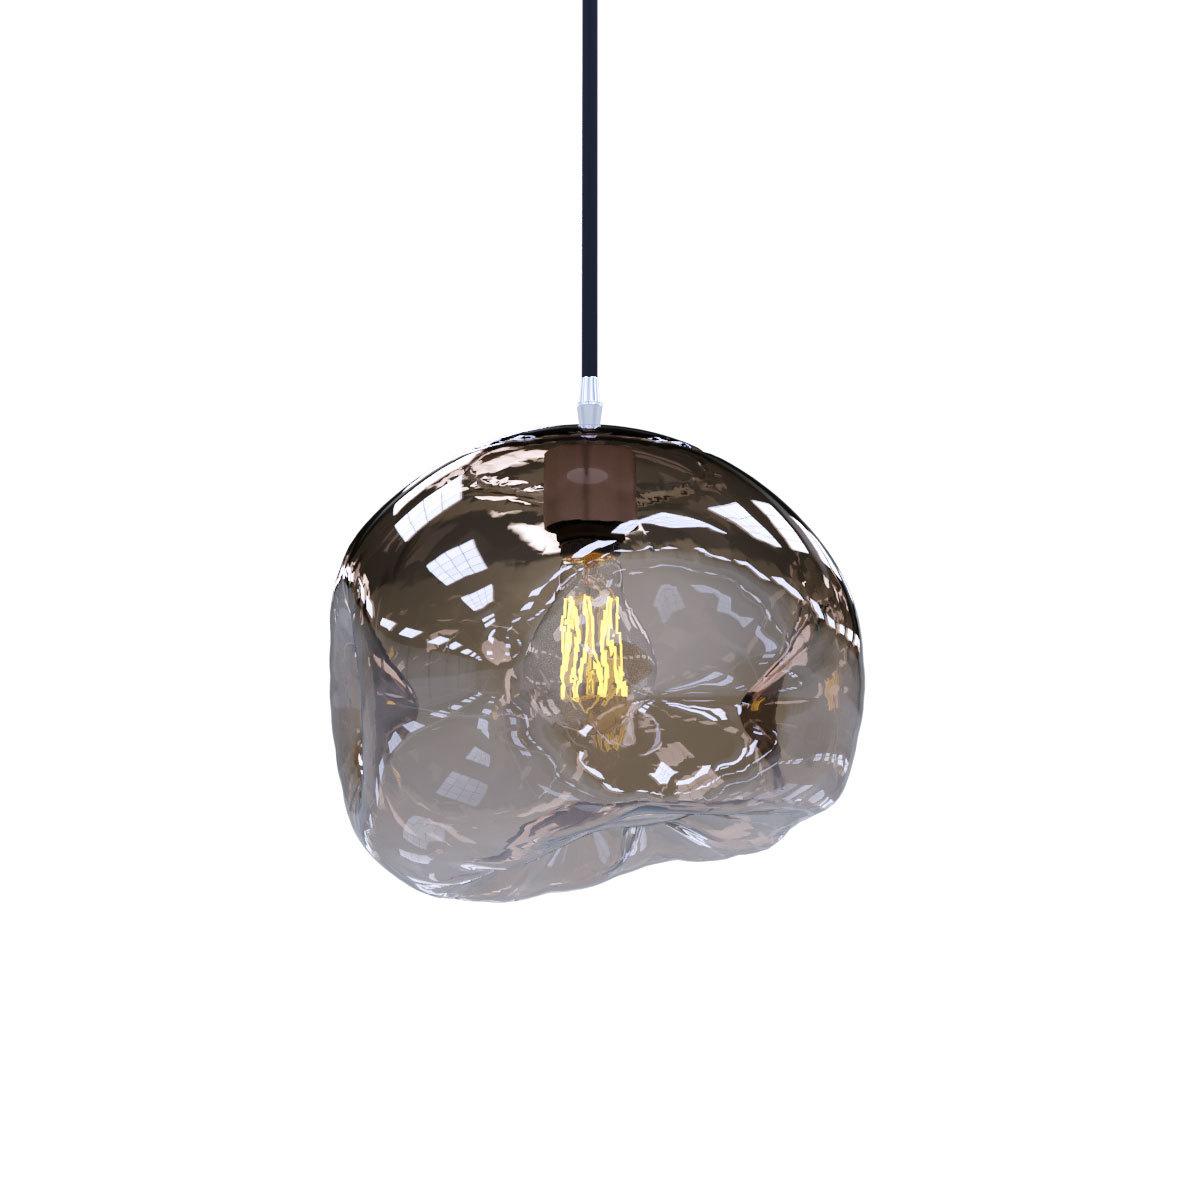 Подвесной светильник Loft It Melt LOFT2025-CH, 1xE27x40W - фото 2